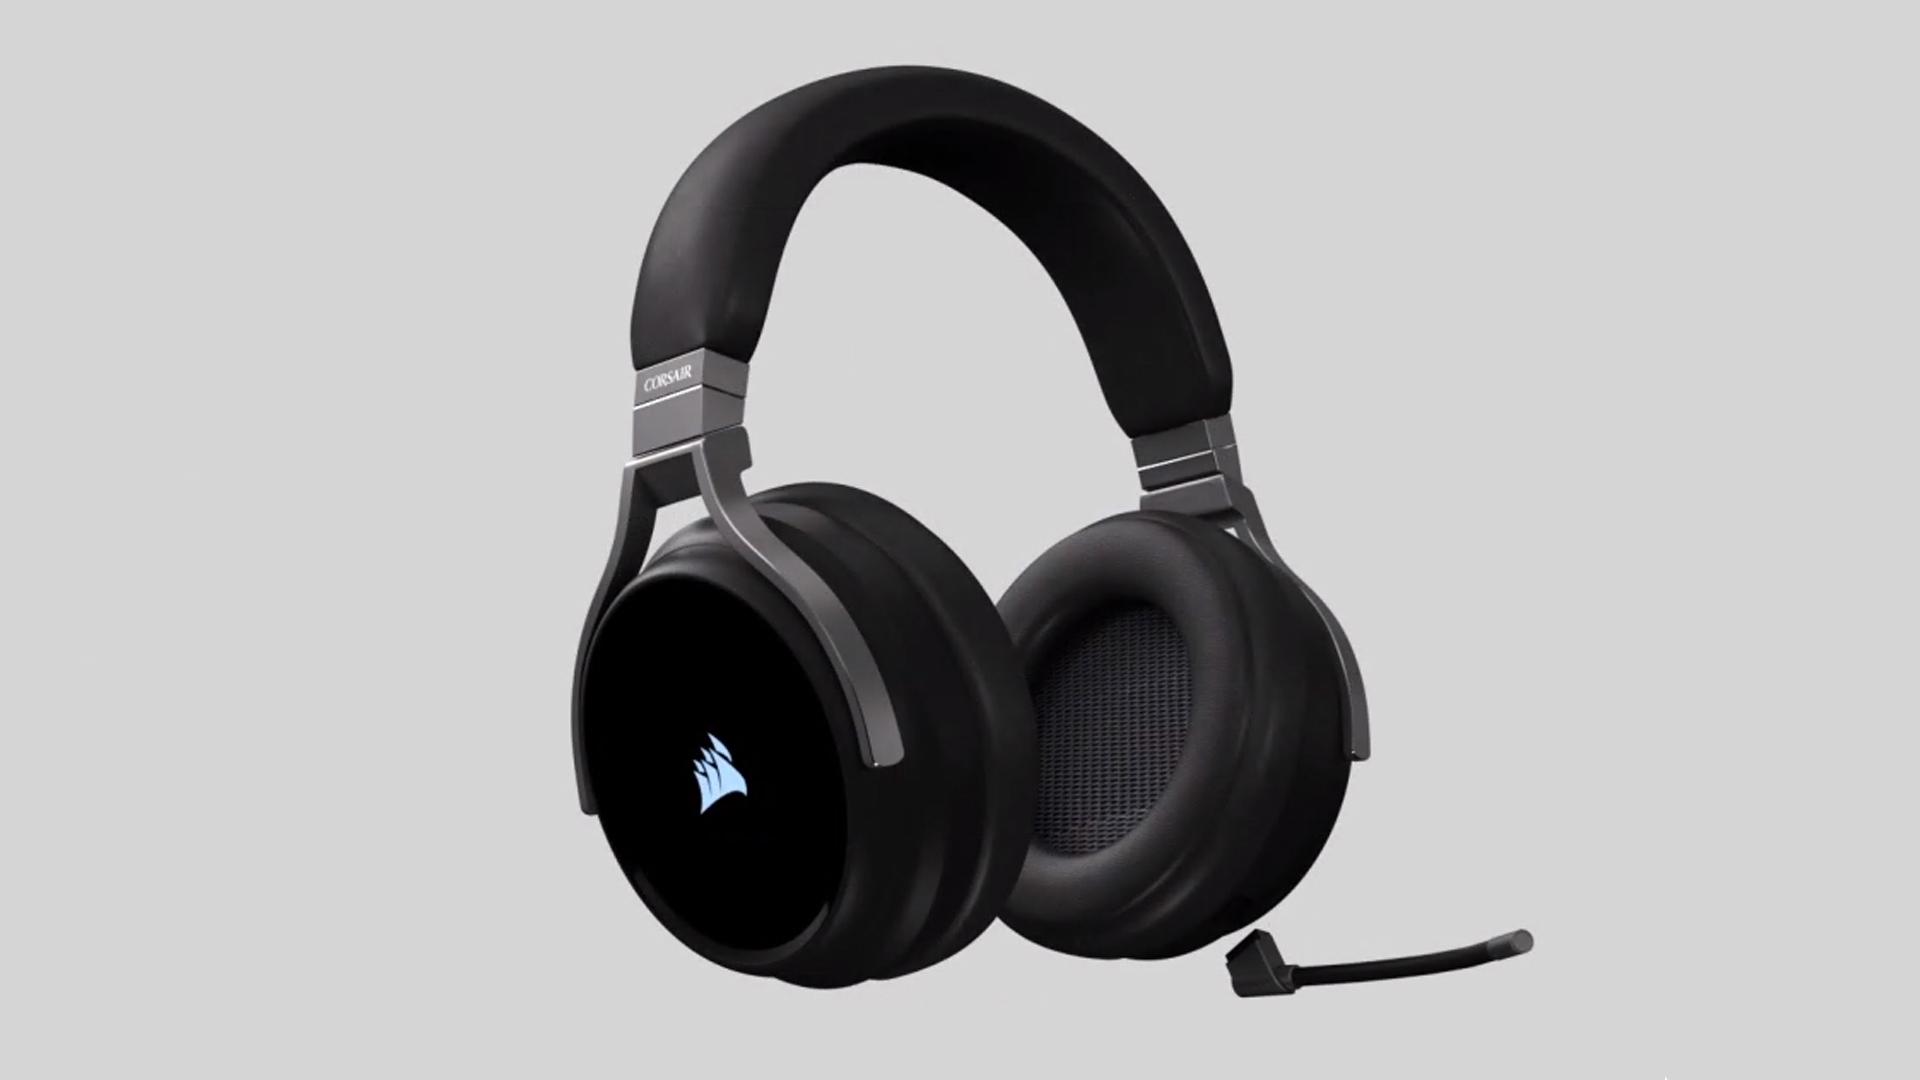 Microfone do Corsair Virtuoso Premium